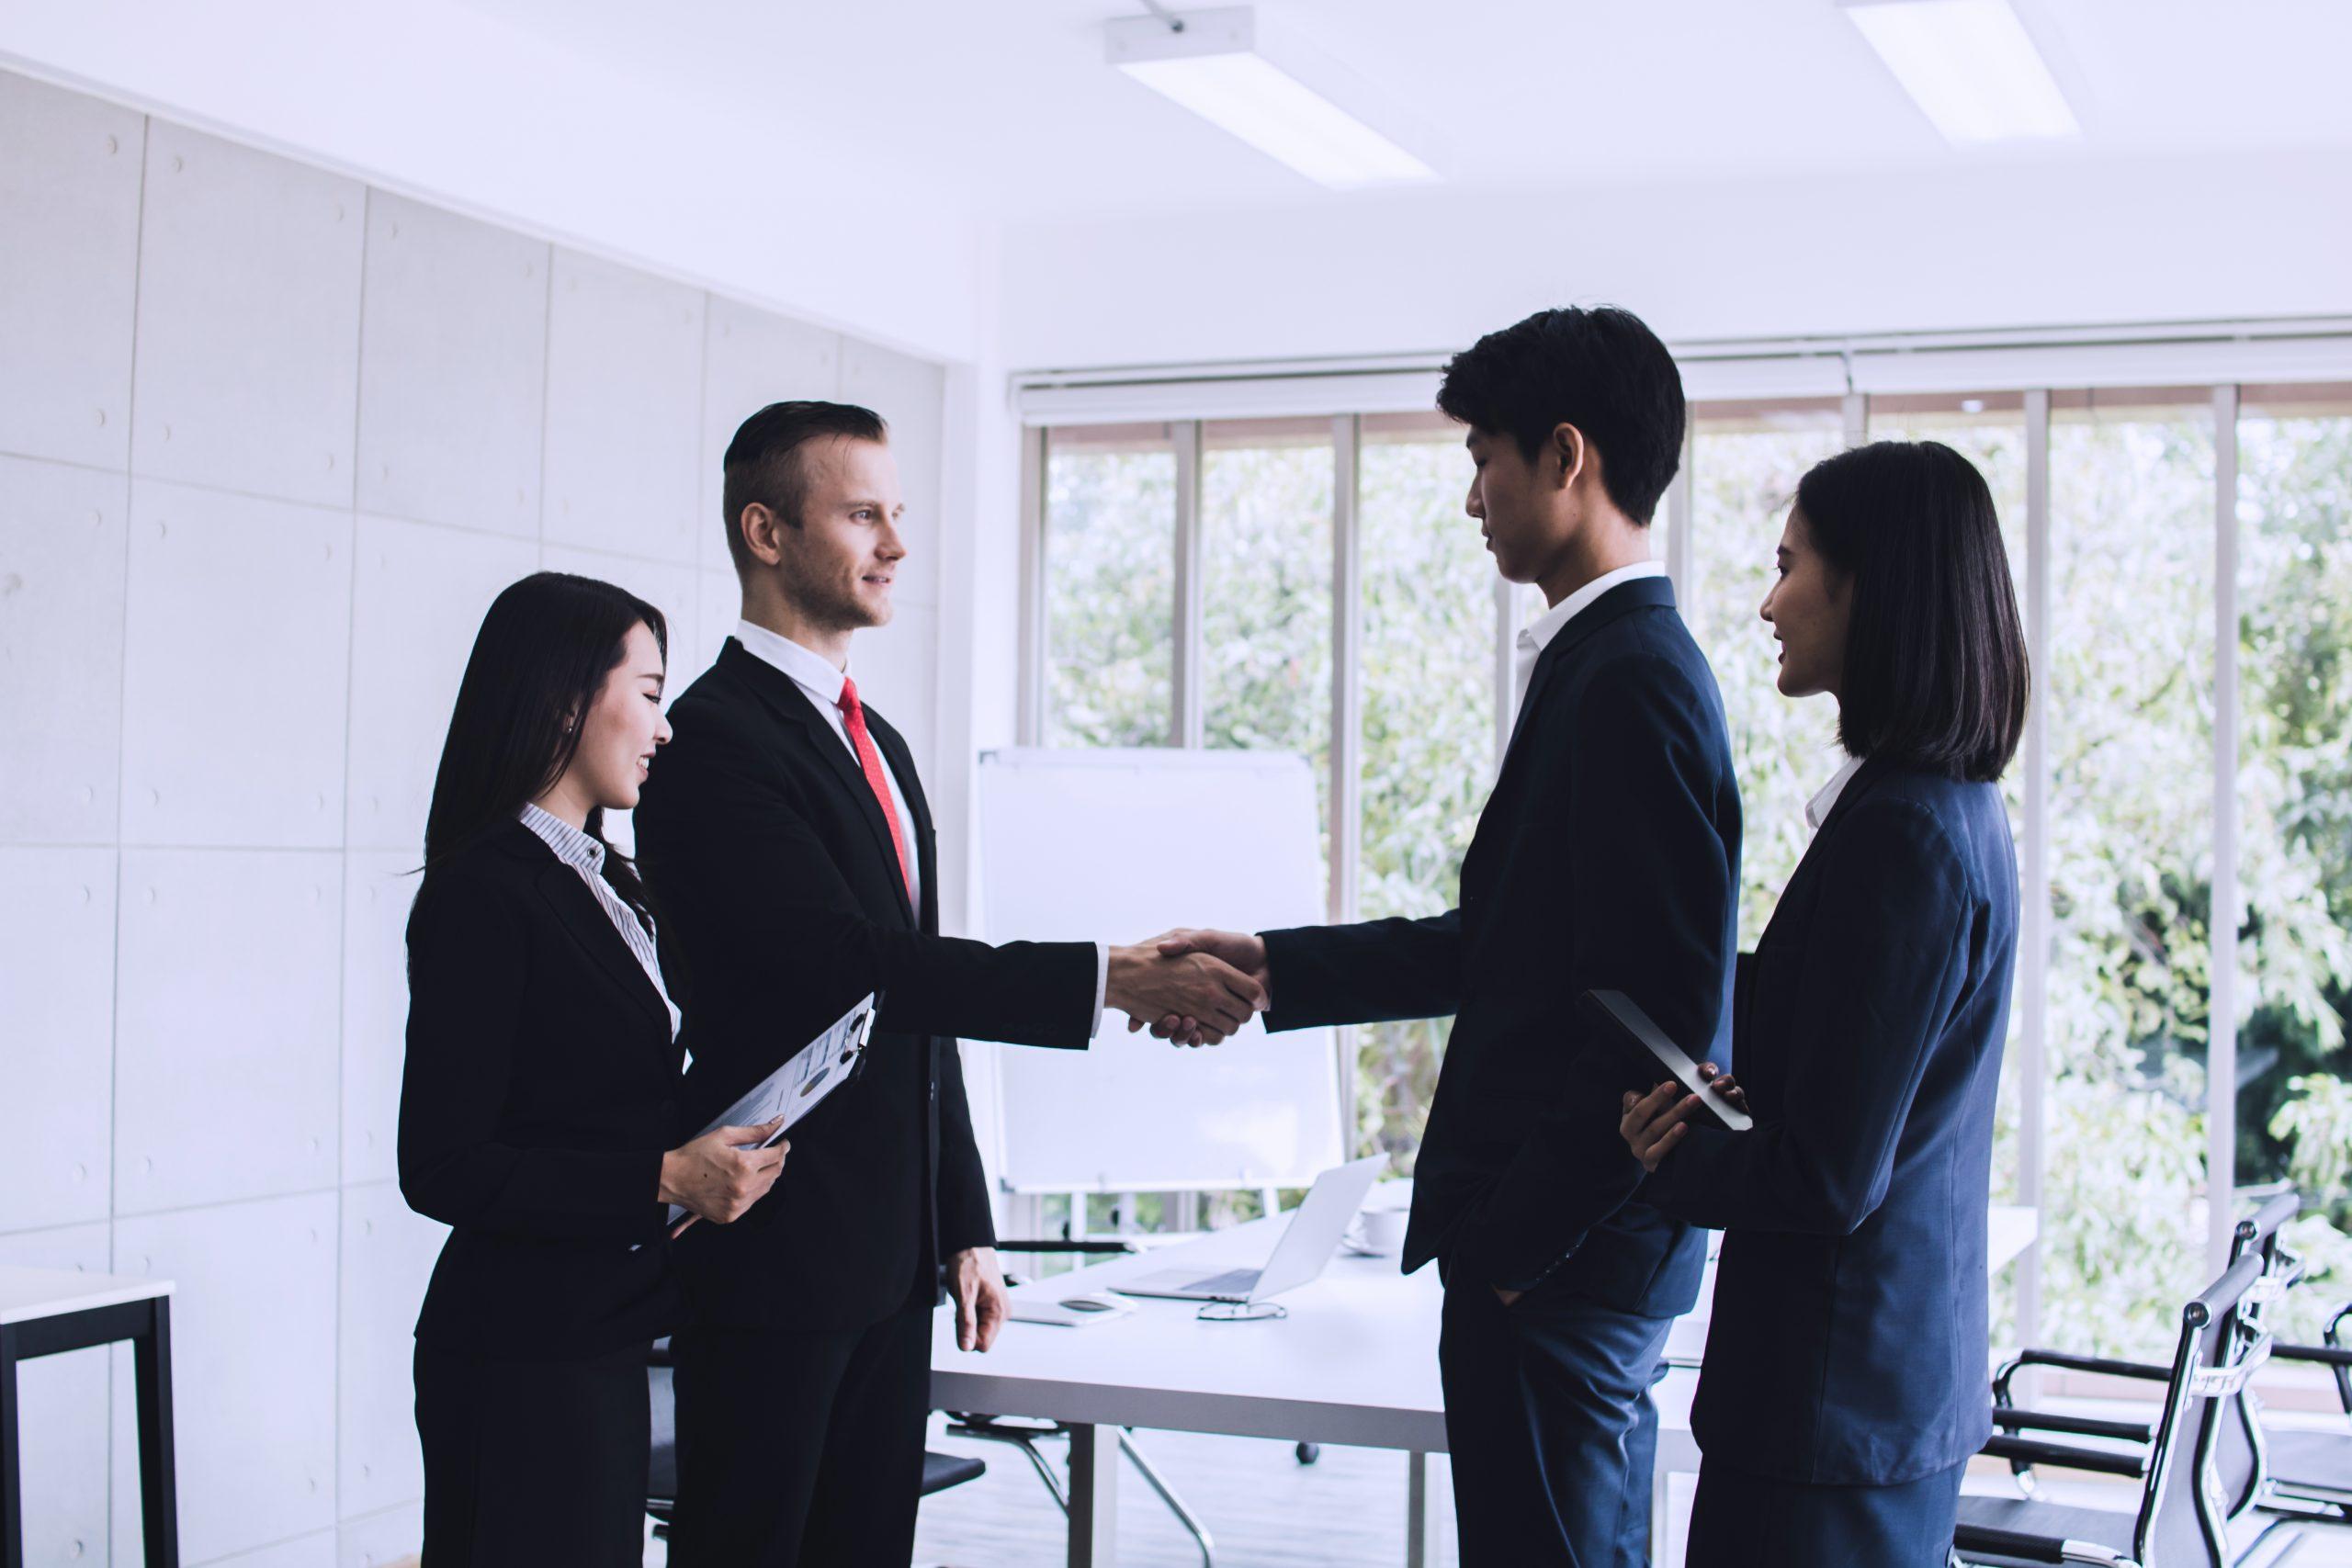 business interpreter shaking hands after successful meeting